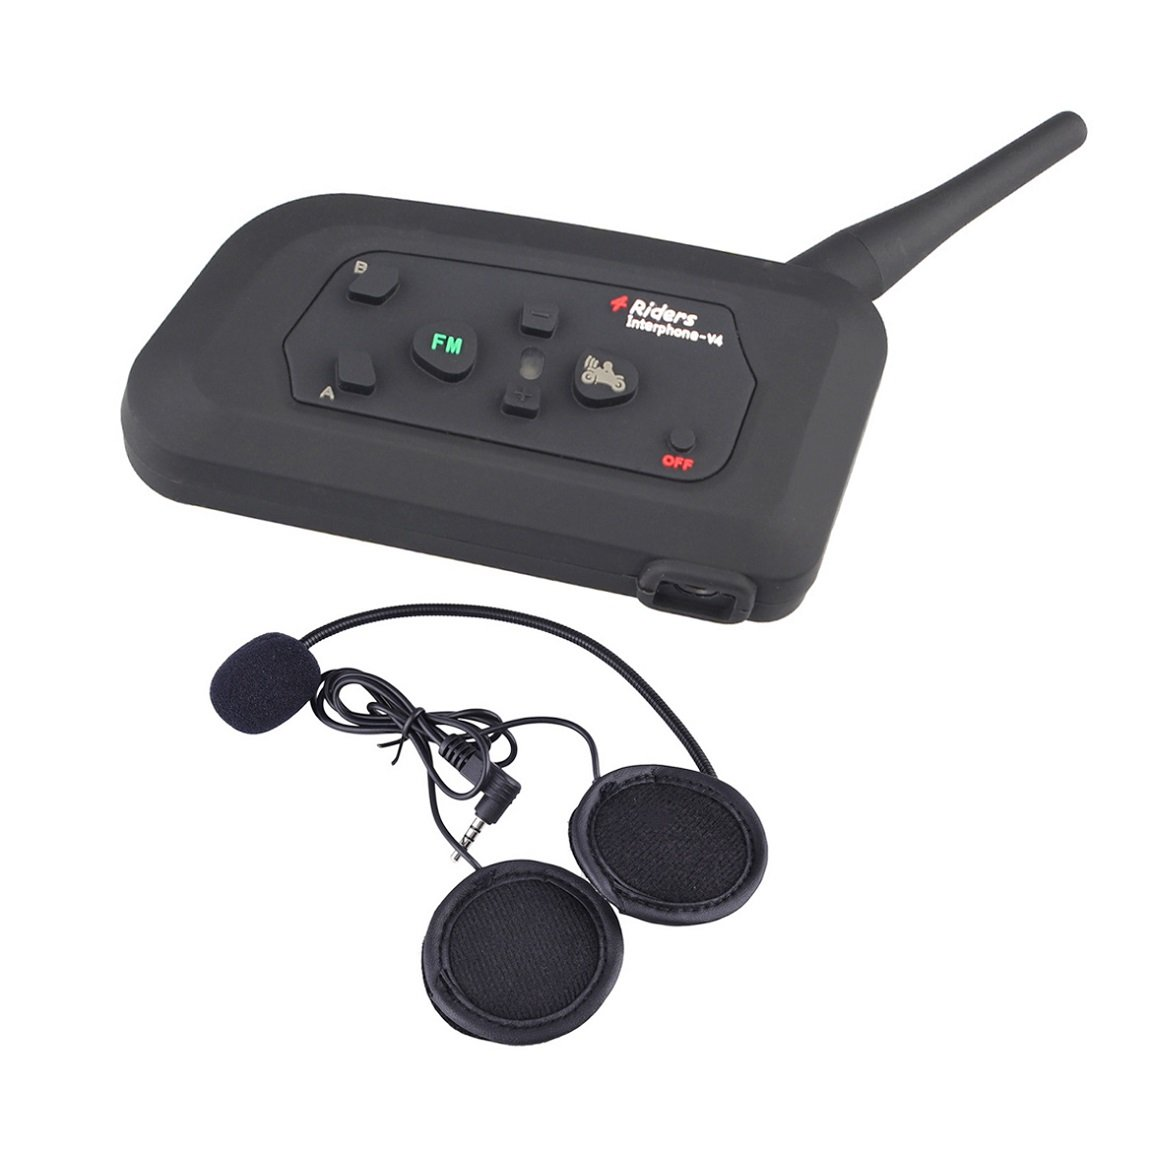 Vnetphone V4 Bluetooth Intercom Motorcycle 4 Riders Helmet Waterproof Interphone 1200M Range - Multi Wireless communication support FM Great for Snowmobile Skiing Riding(1 PC)